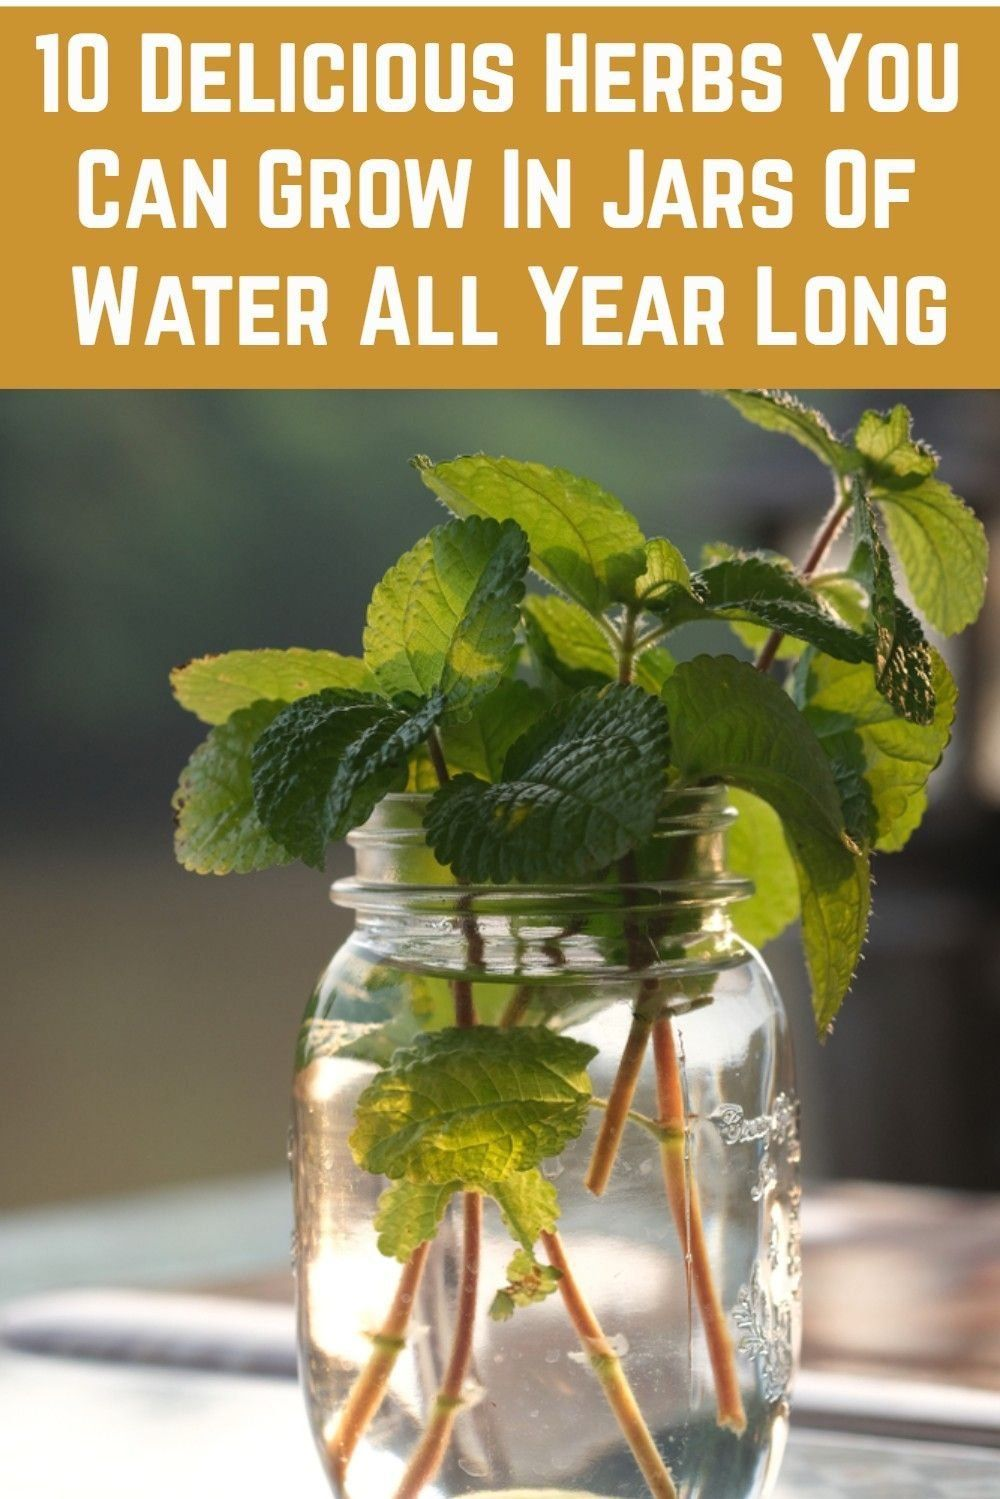 how to grow cilantro indoors year round